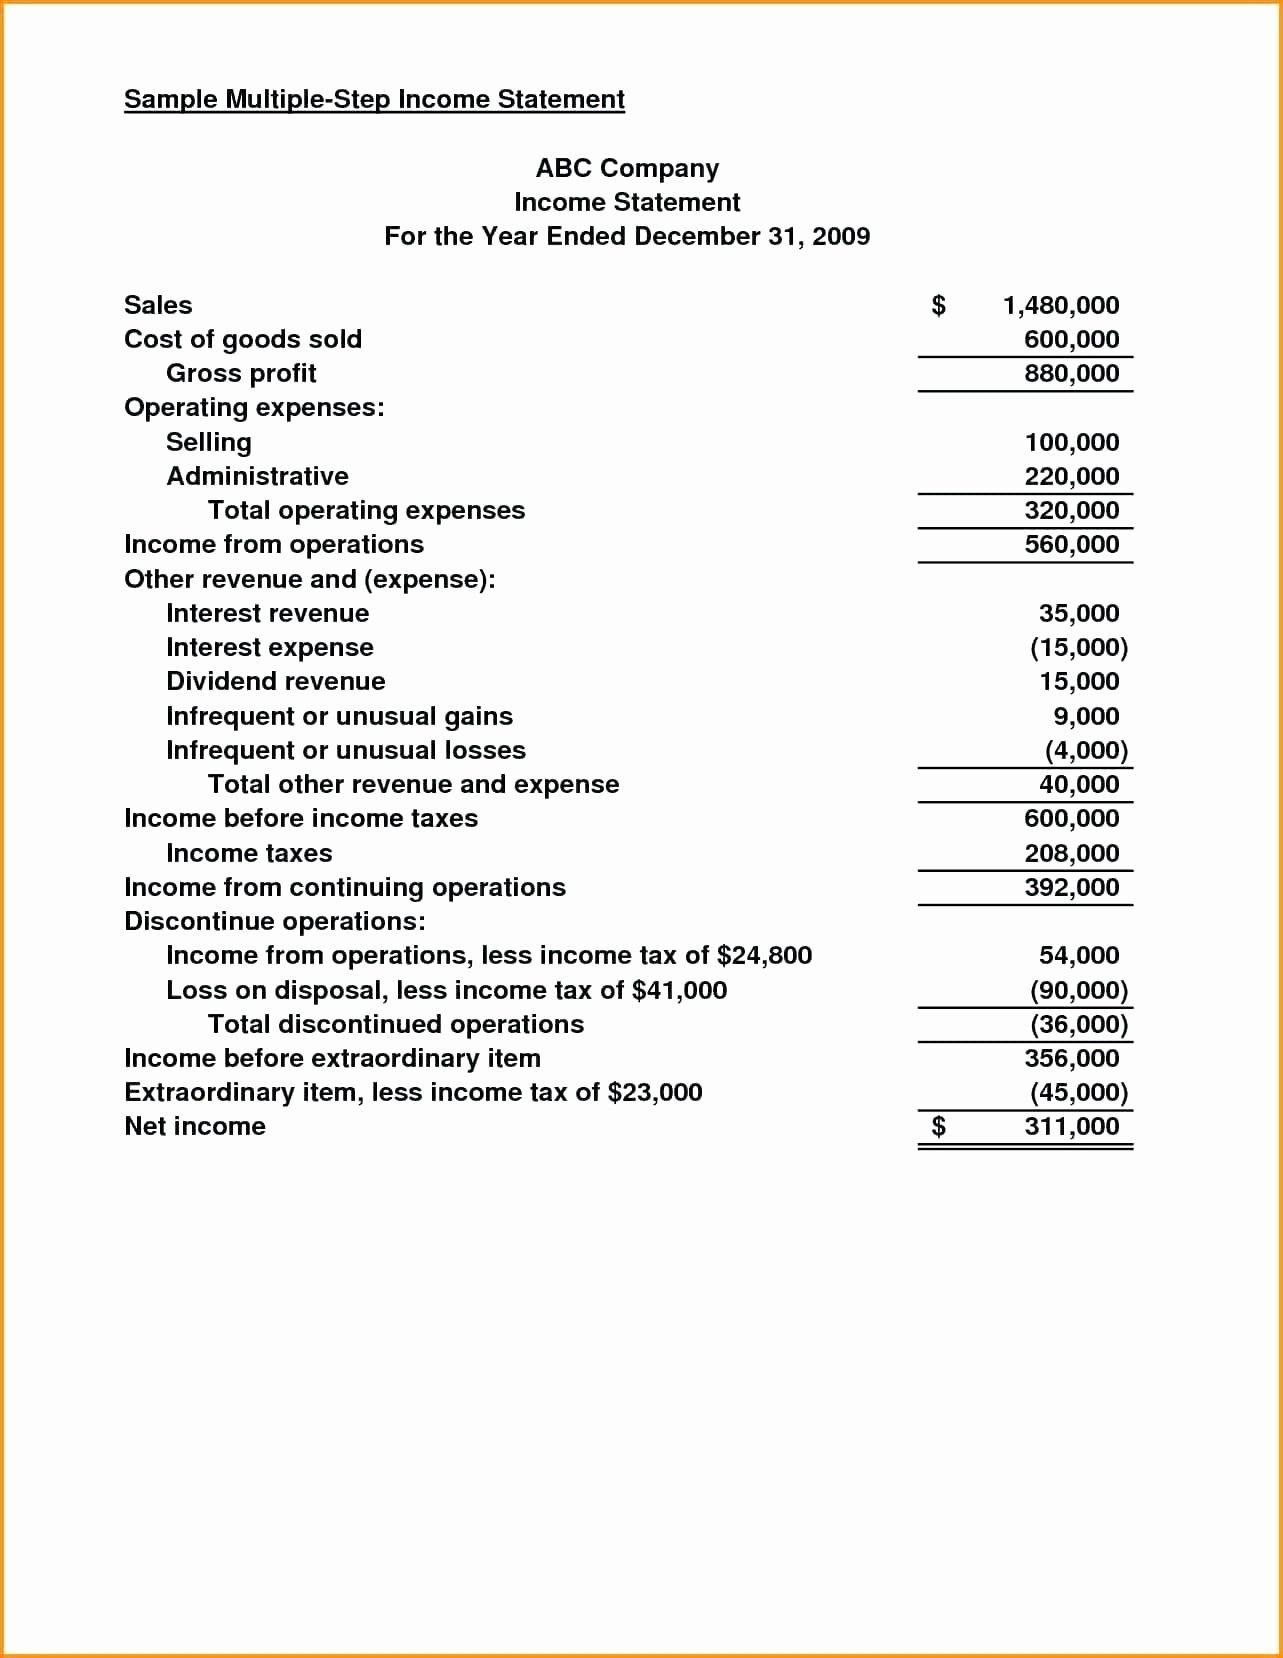 Unique Sample Personal Financial Statement Excel Exceltemplate Xls Xlstemplate Xlsforma Statement Template Financial Statement Personal Financial Statement